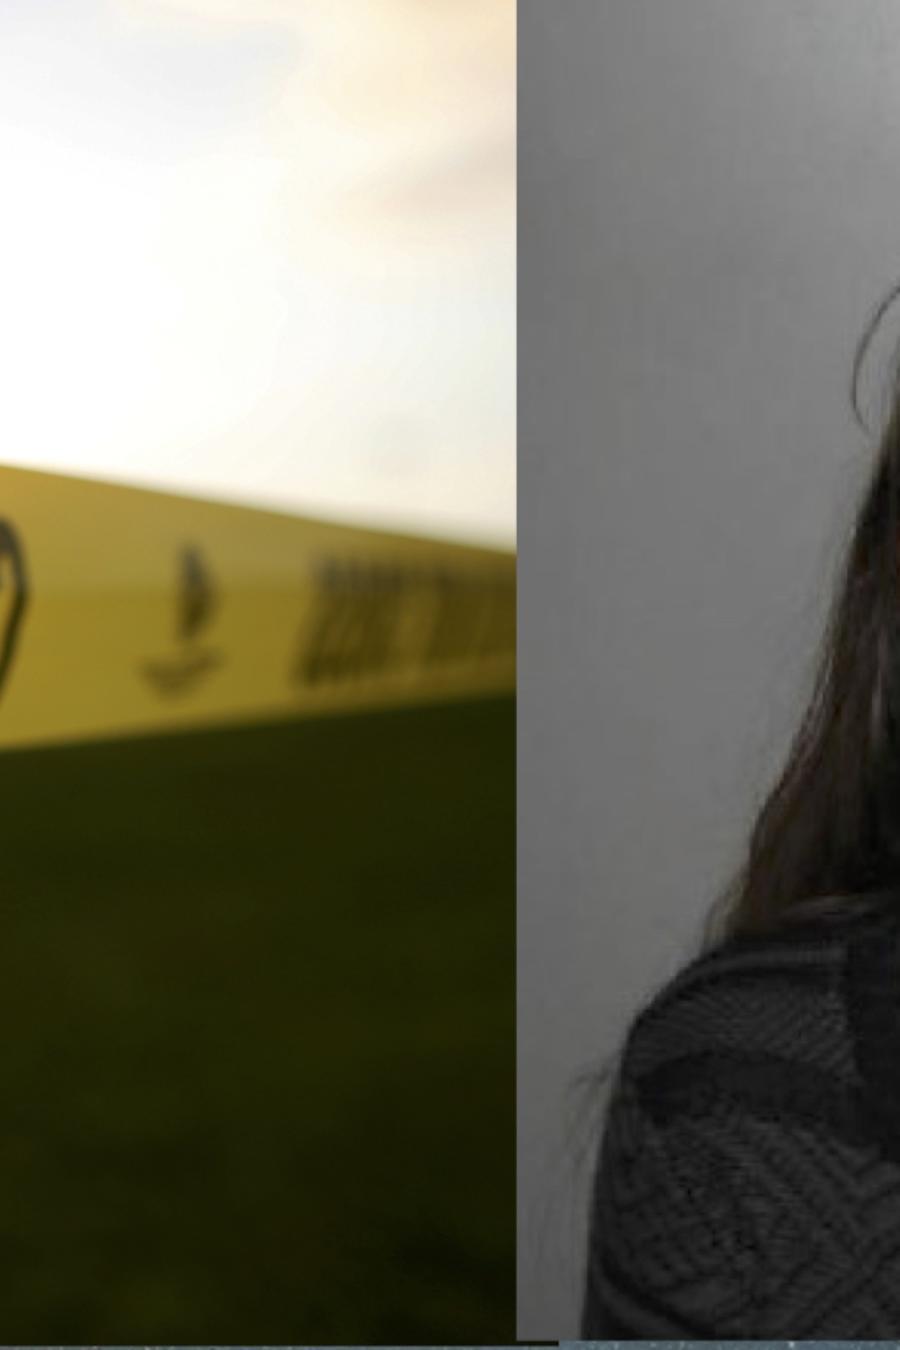 Cordon policial de la escena de un crimen, e imagen de Iris Hernández Rivas